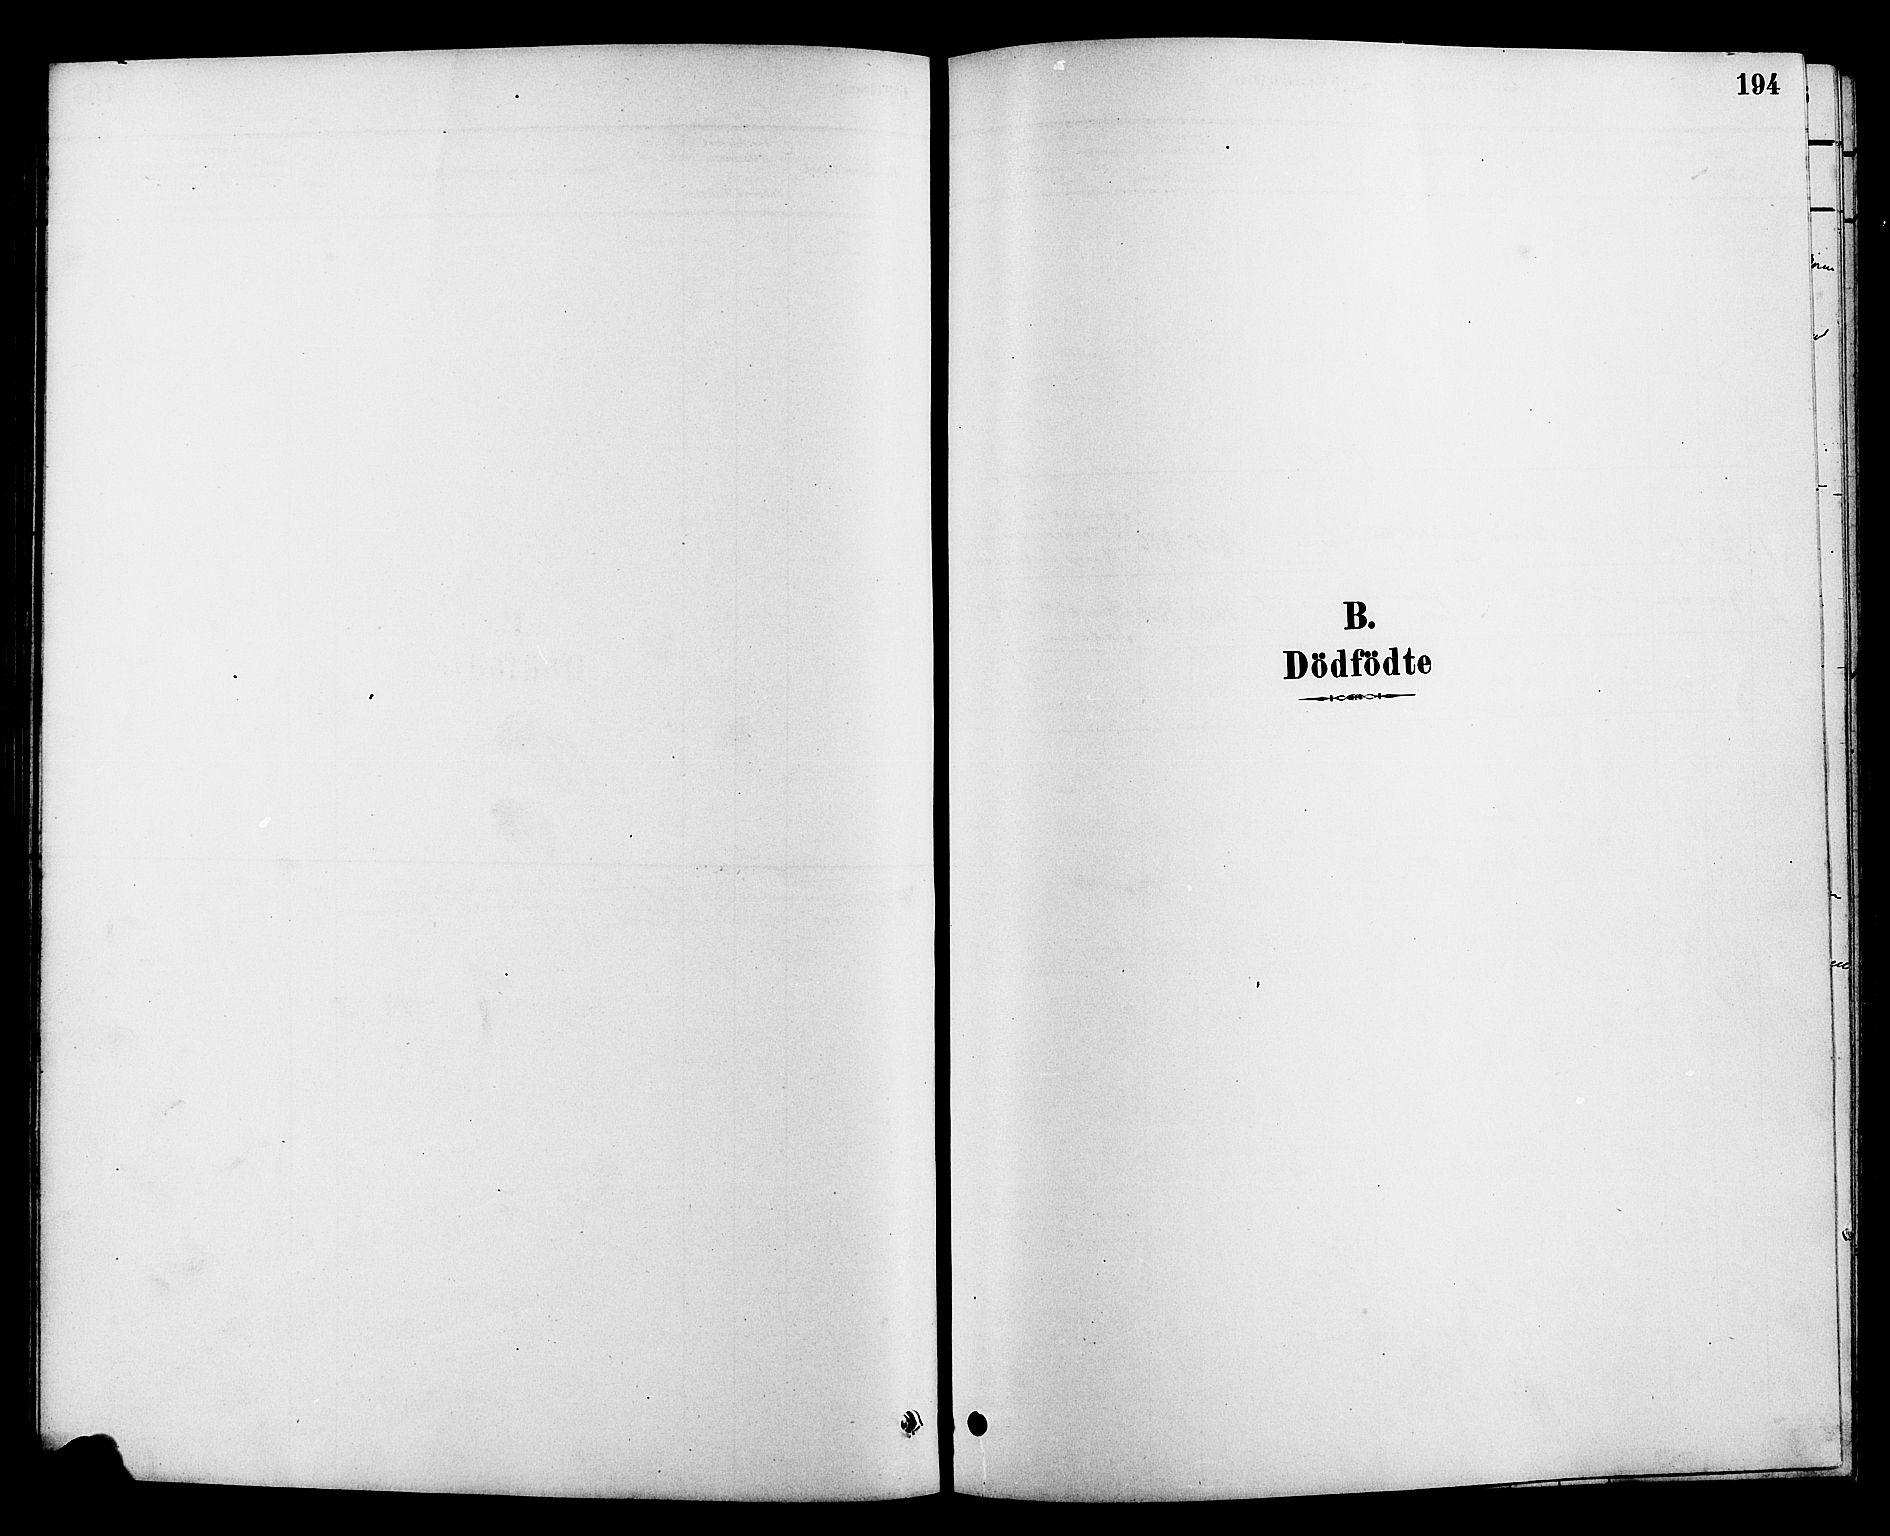 SAKO, Heddal kirkebøker, G/Ga/L0002: Klokkerbok nr. I 2, 1879-1908, s. 194